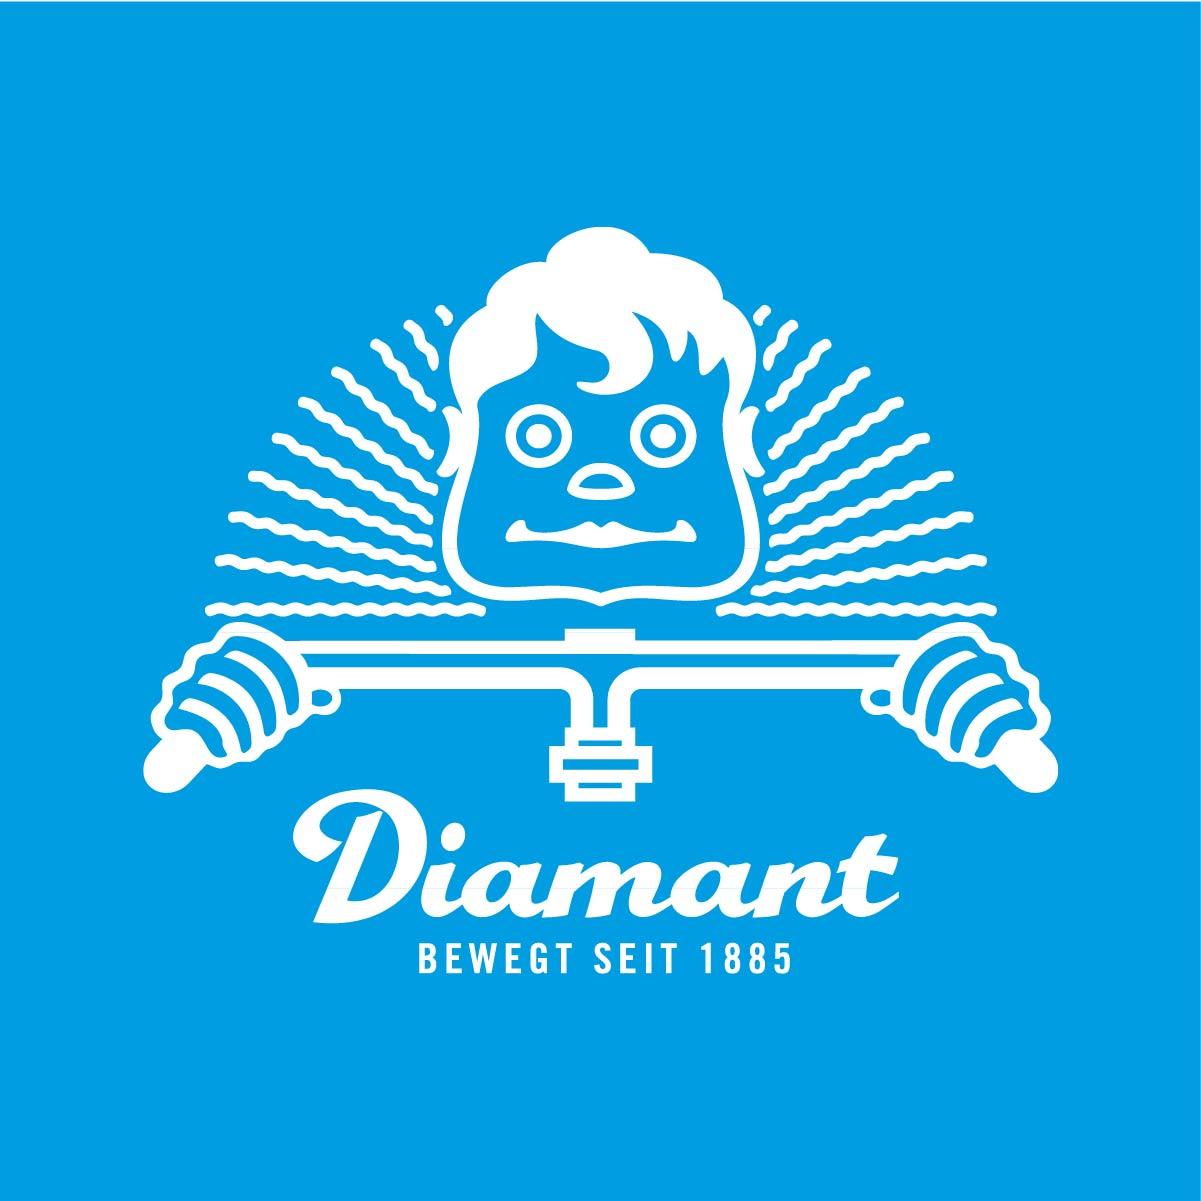 Diamant Logo Entwurf Wort-Bild-Marke Lenkerkopf Plakette Köpfchen